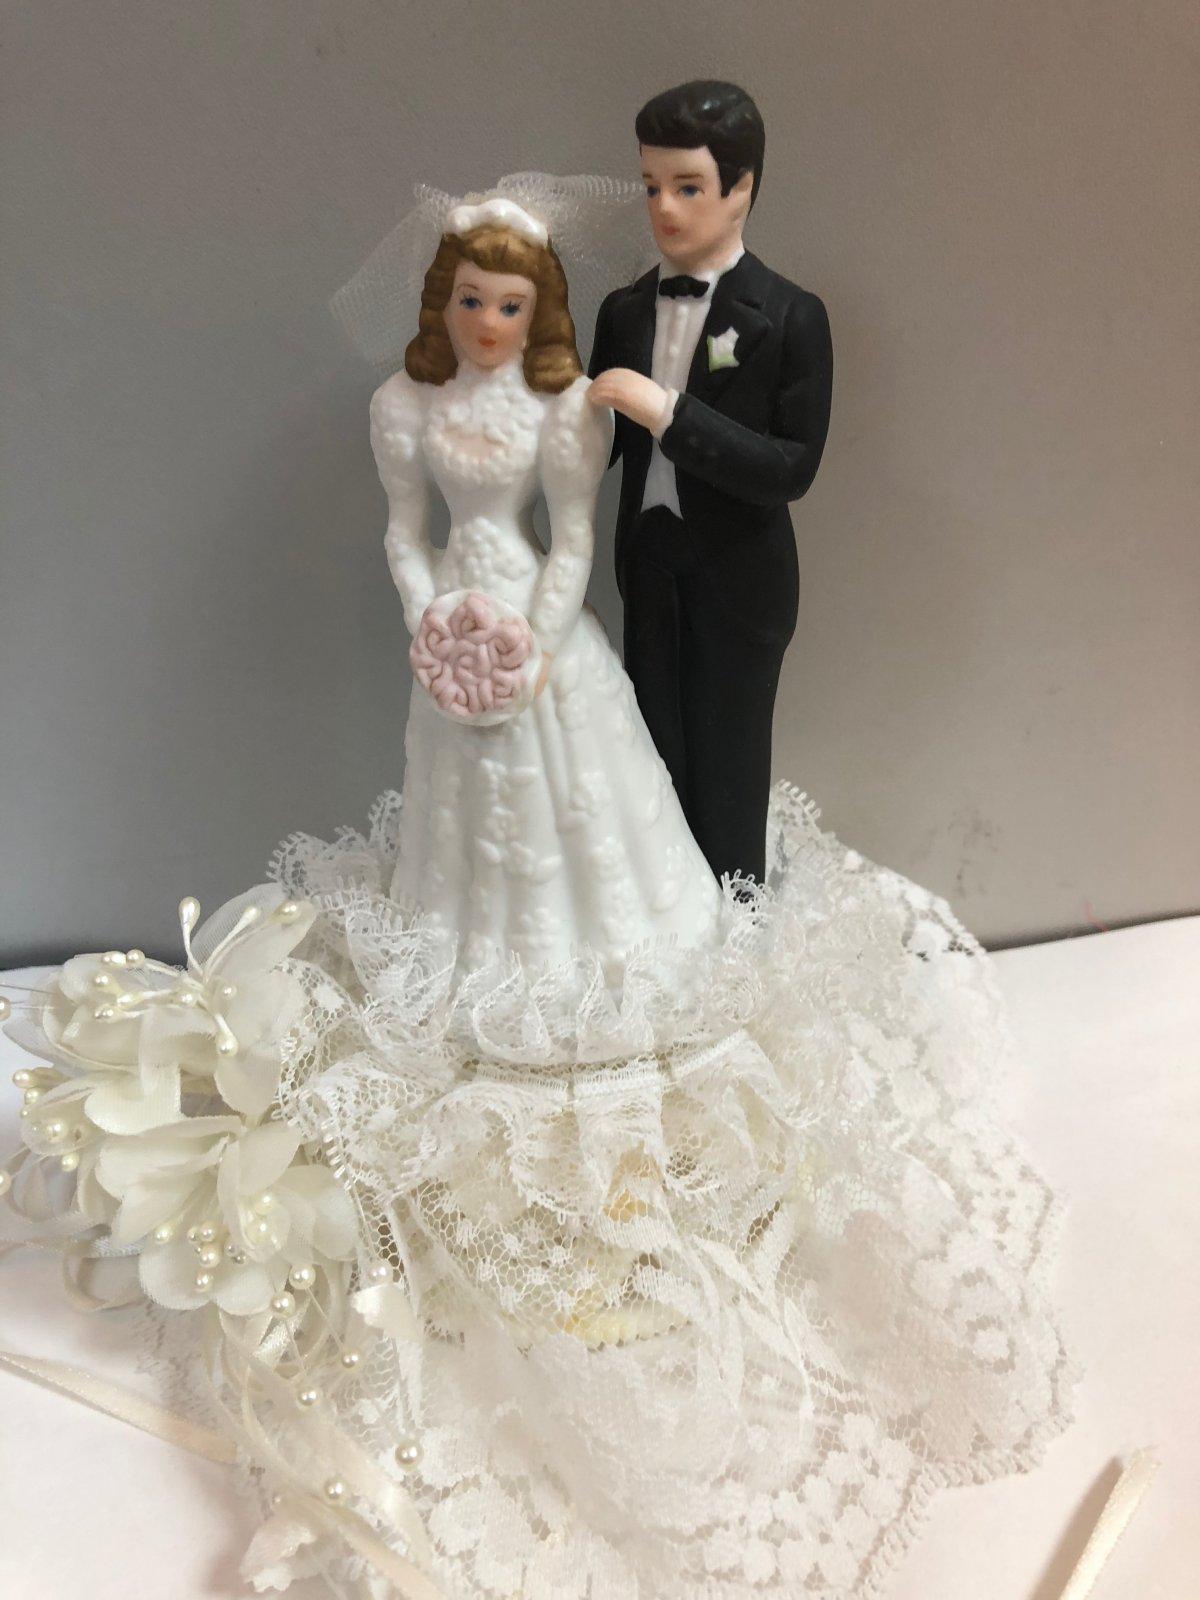 Delicate Joy  Bride & Groom  Cake Topper